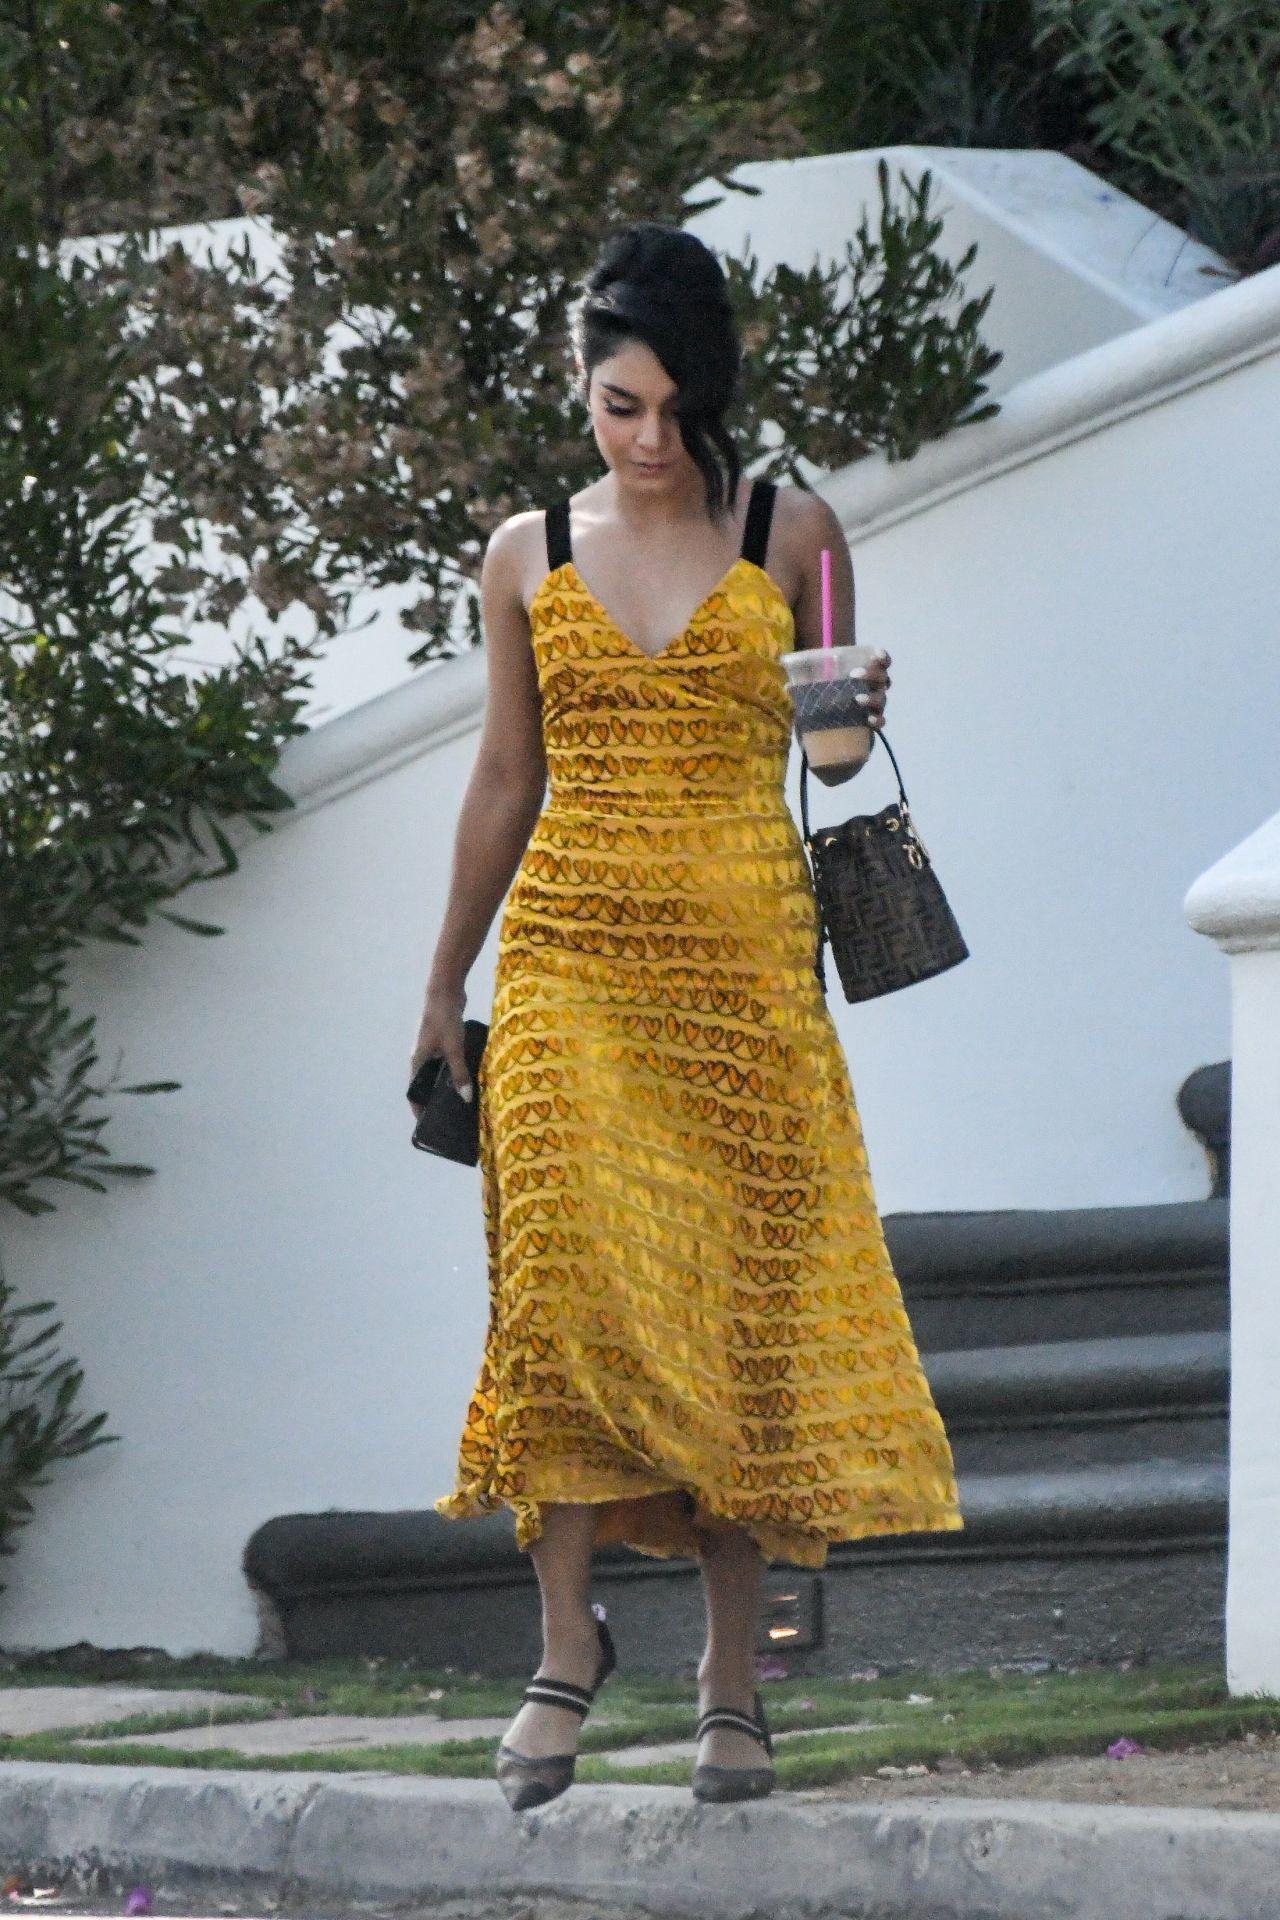 Vanessa Hudgens In A Yellow Summer Dress In La 08 04 2018